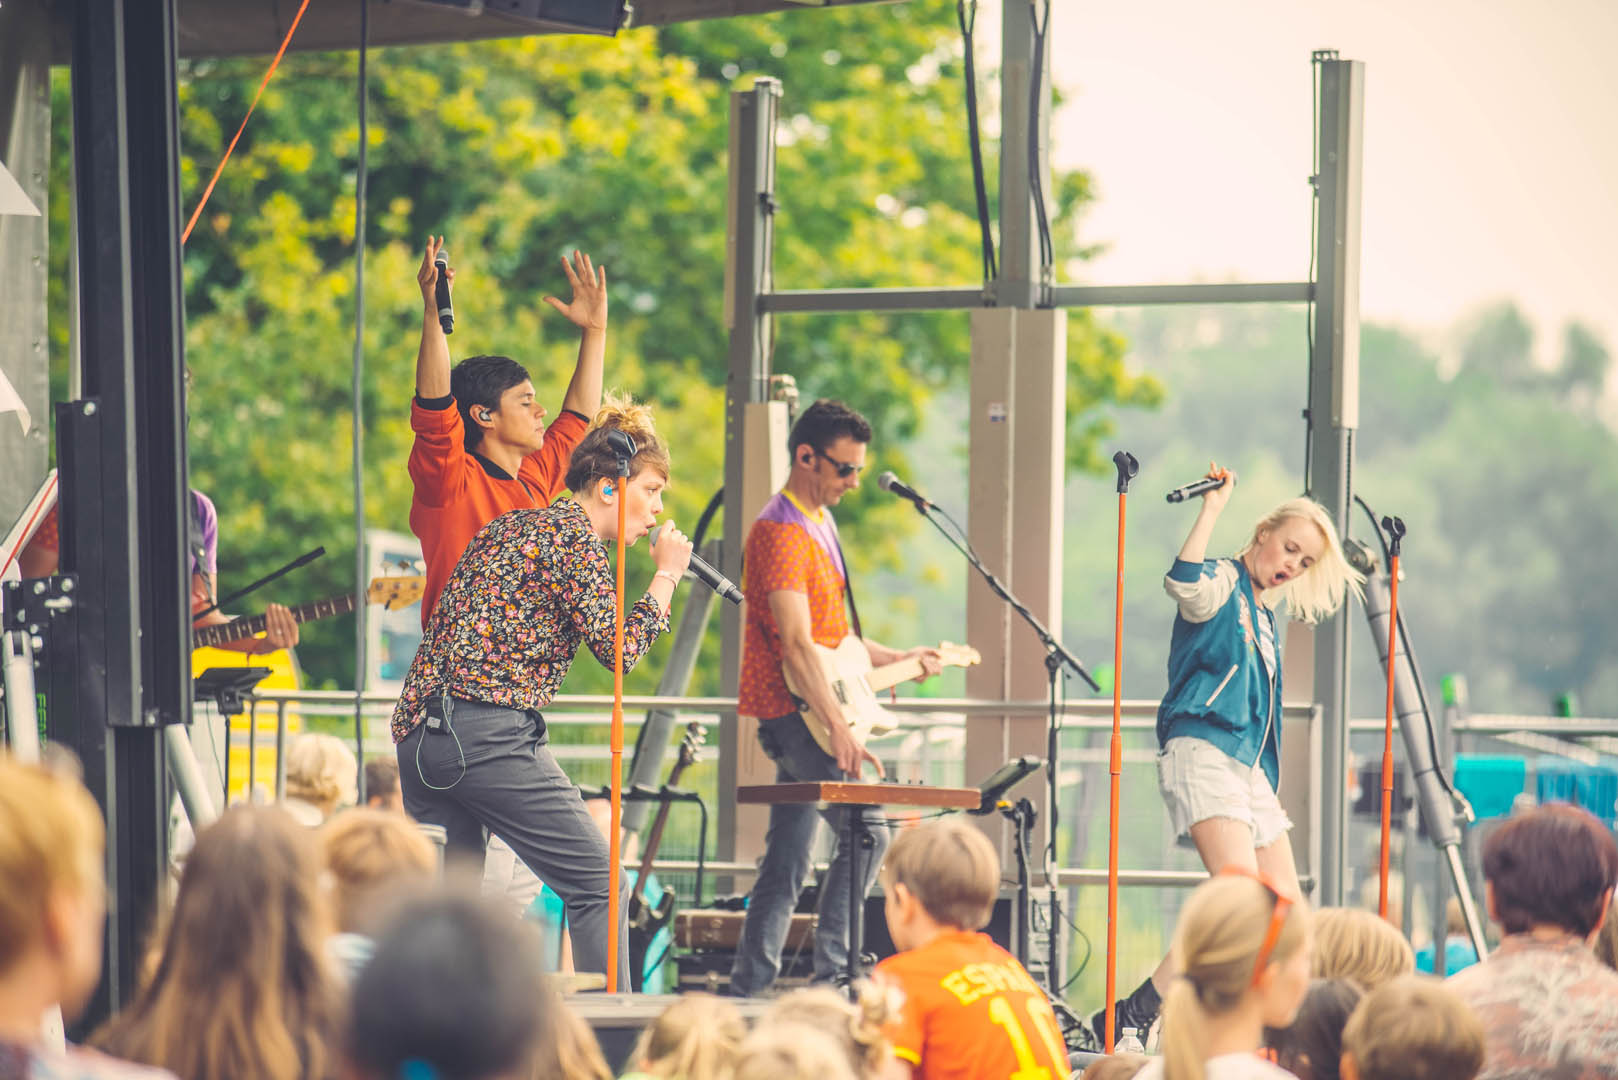 Stad Gent Picknick Event Ketnetband